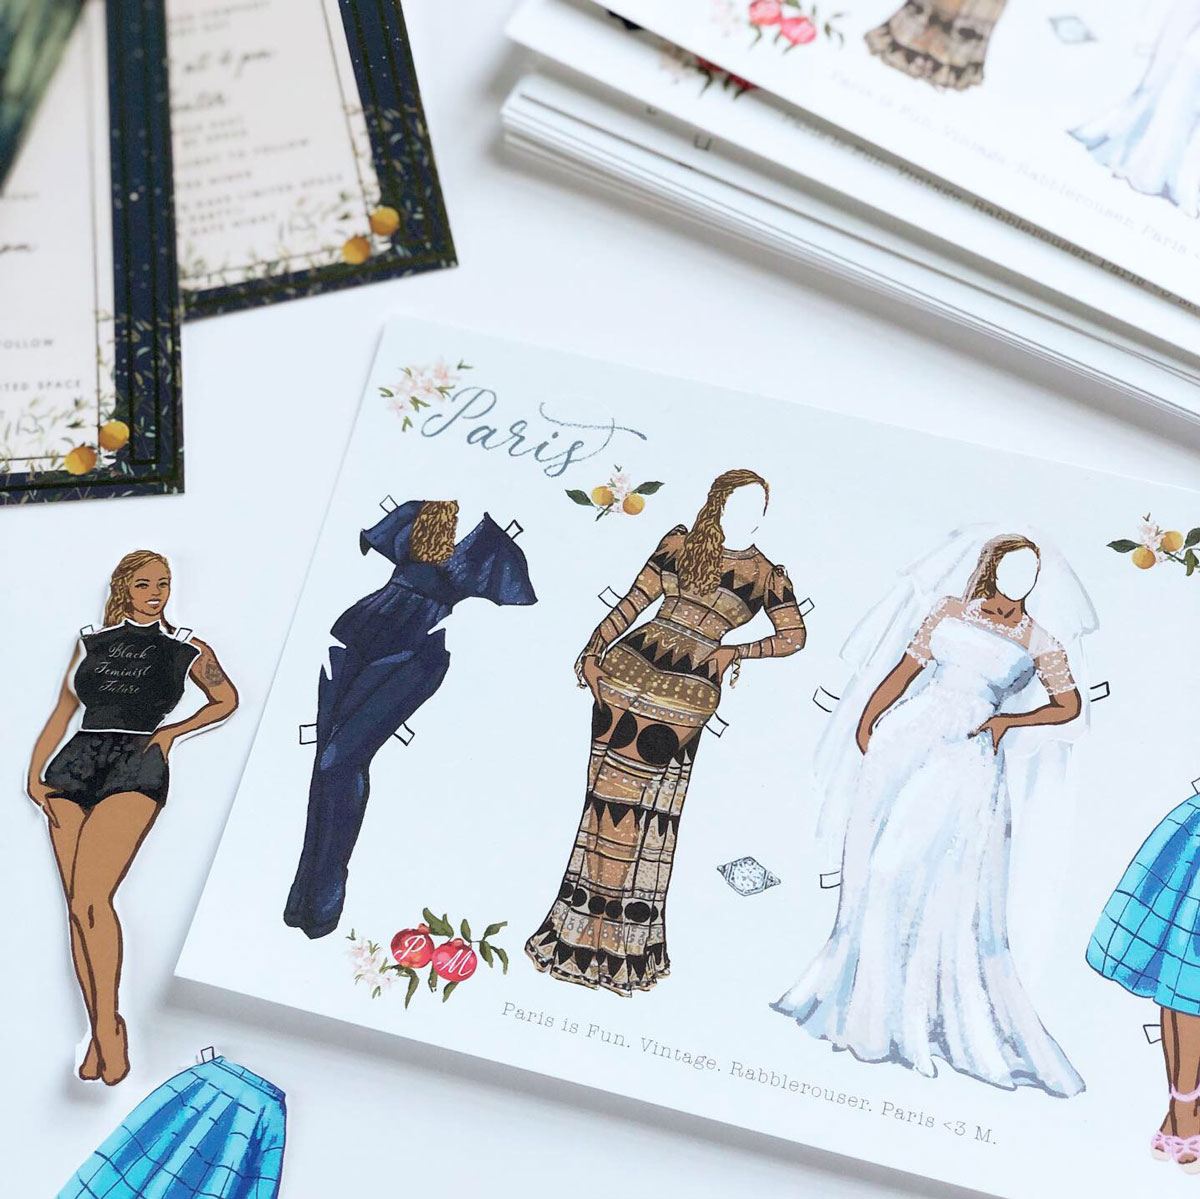 south-carolina-paper-dolls-pride-wedding-jolly-edition-3